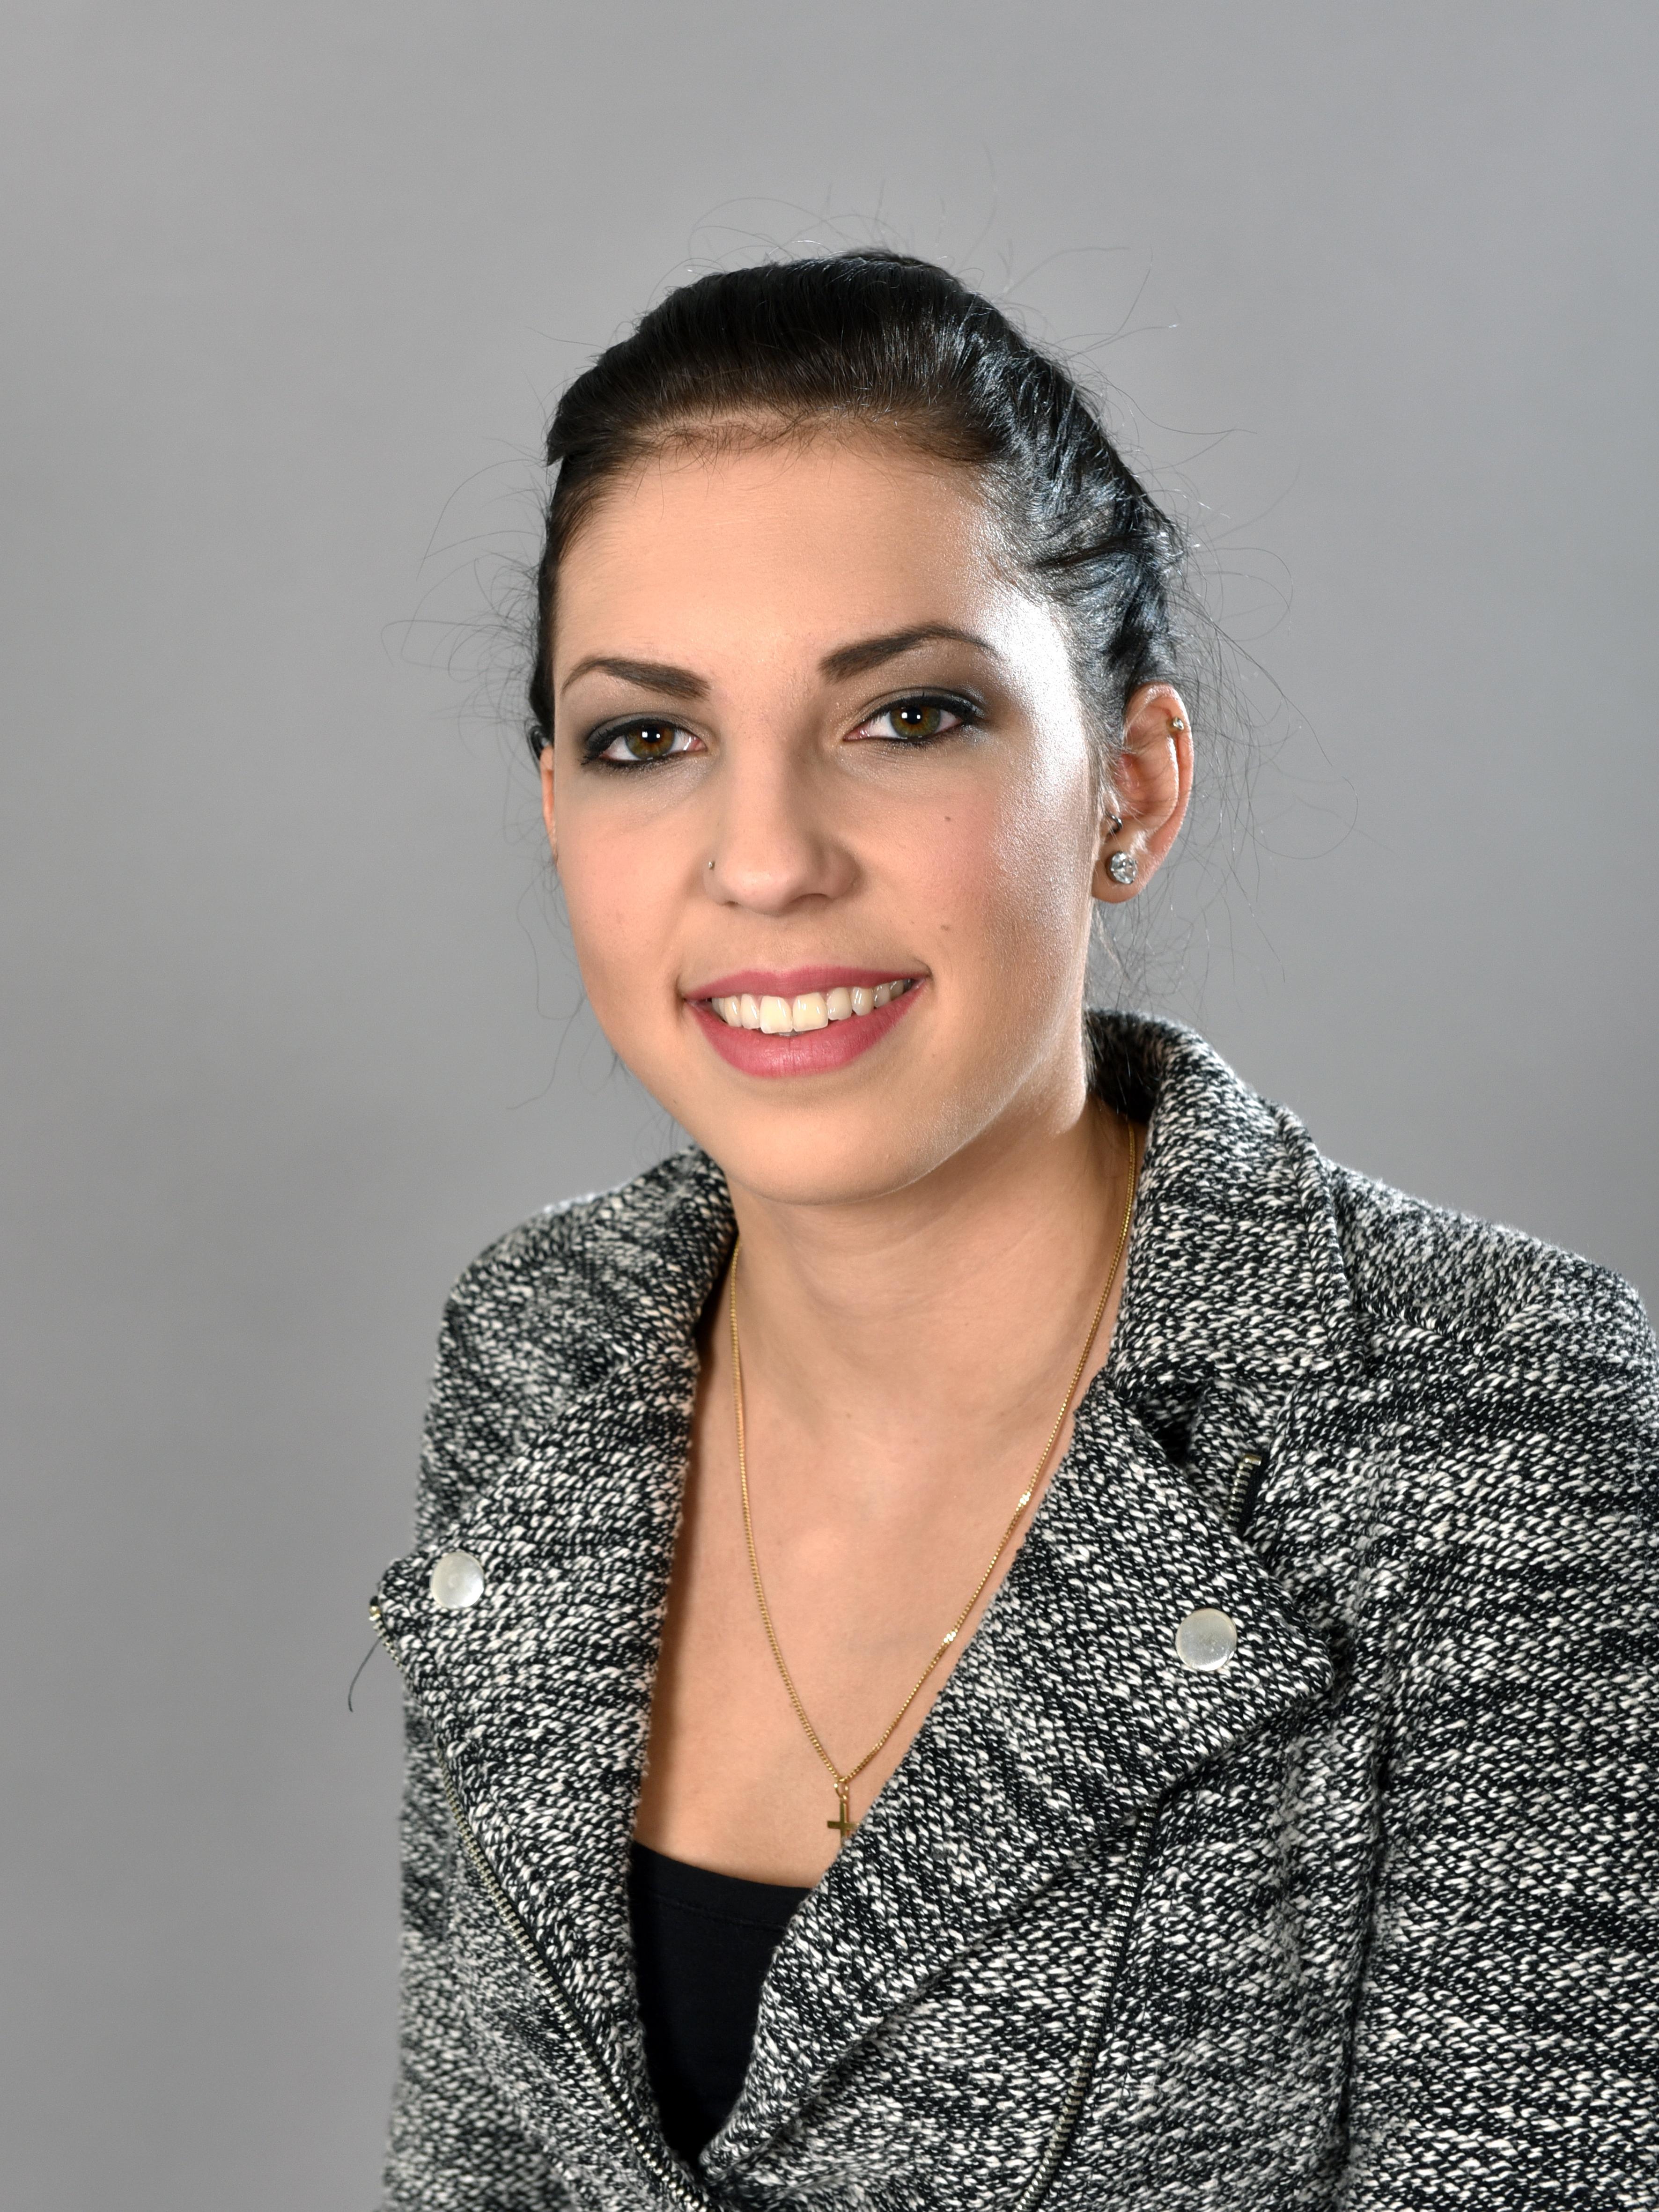 Jotterand Lucie